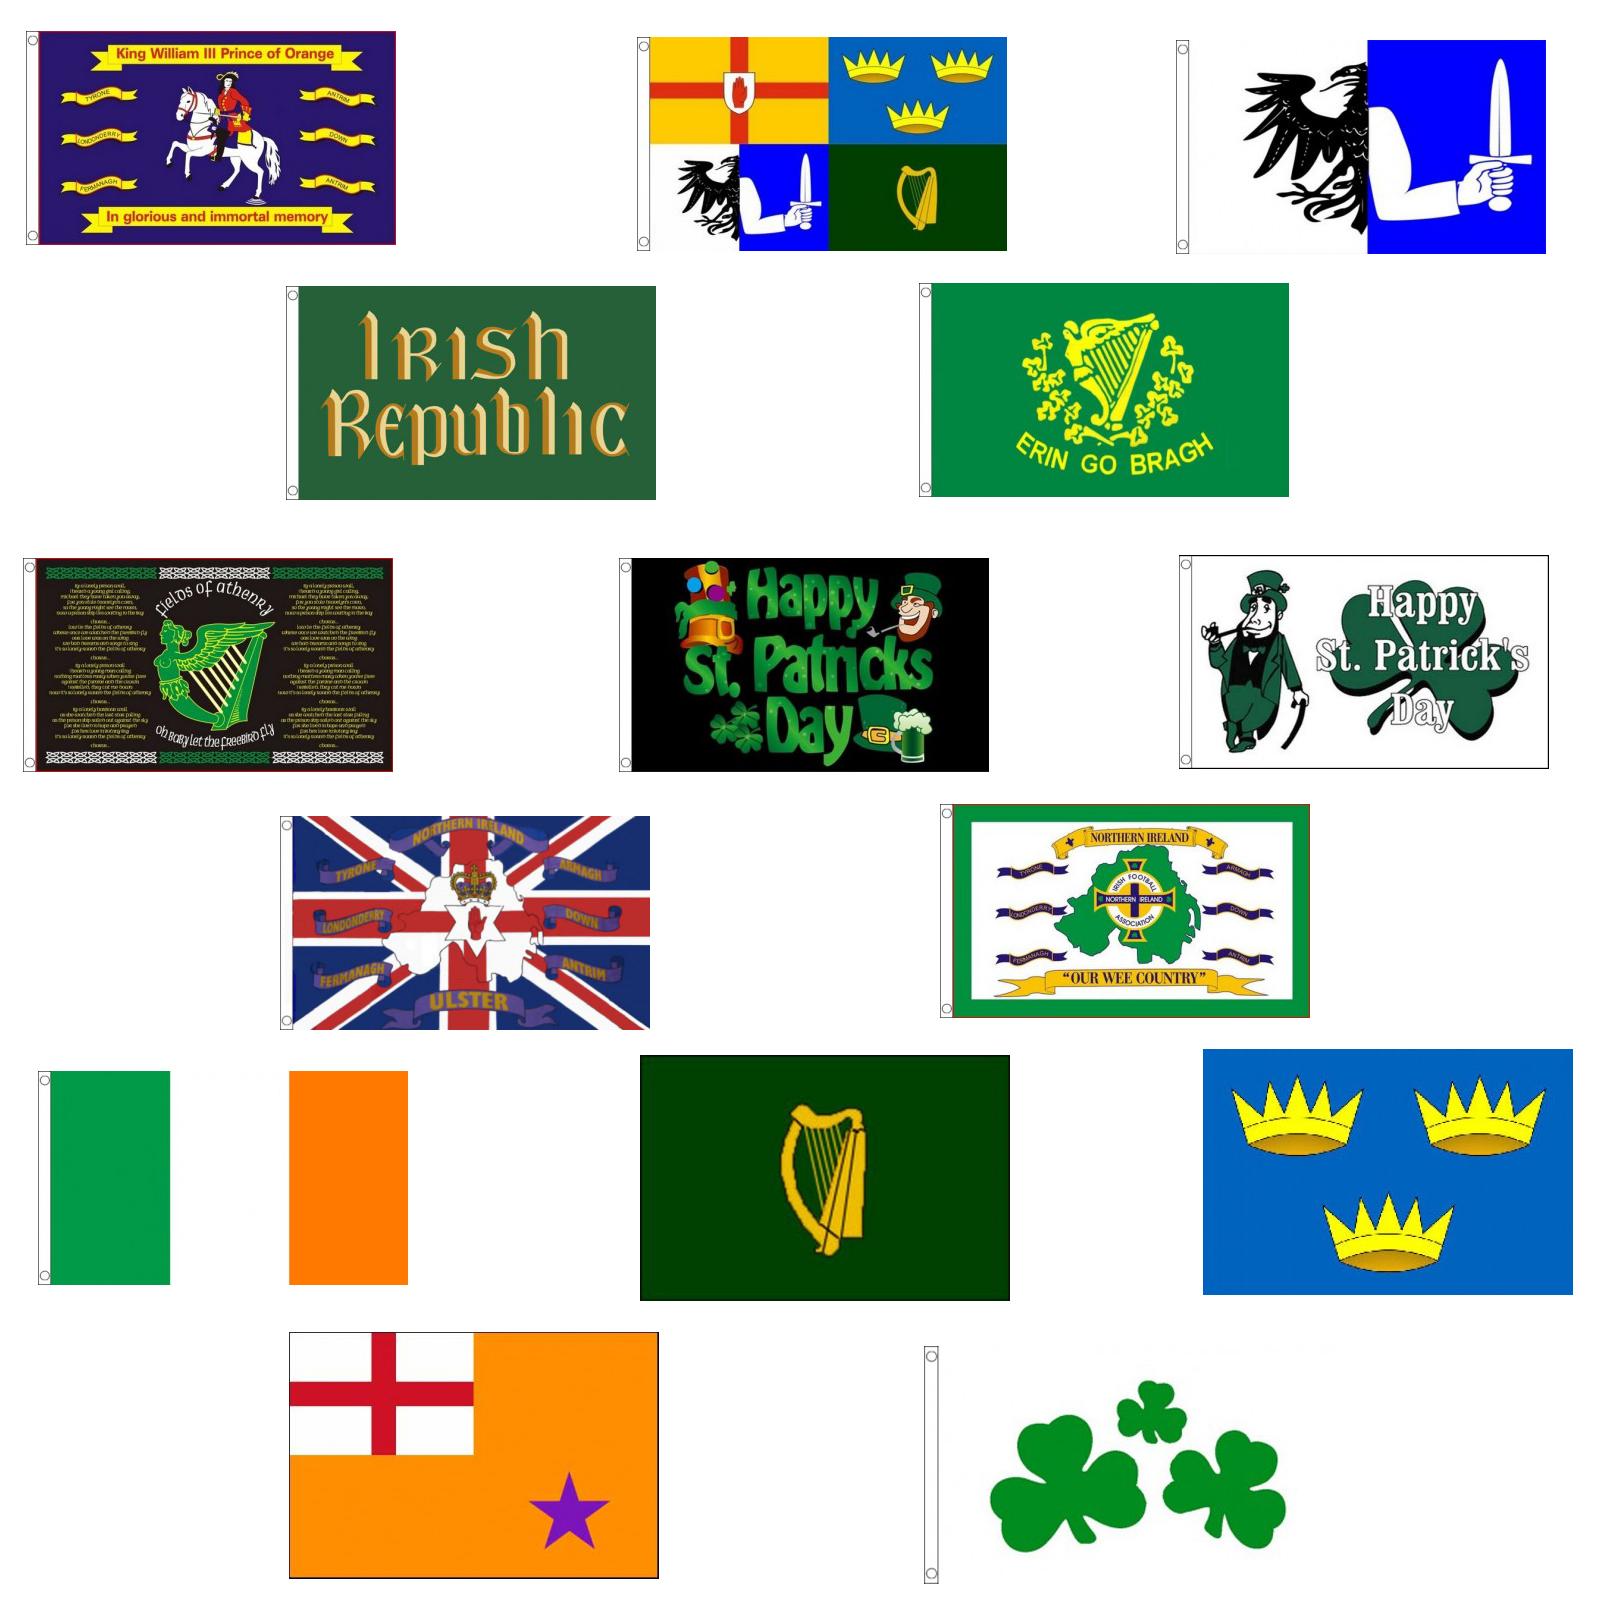 Erin Go Bragh 5/' x 3/' Flag Ireland Eire St Patricks Day 1916 Rising